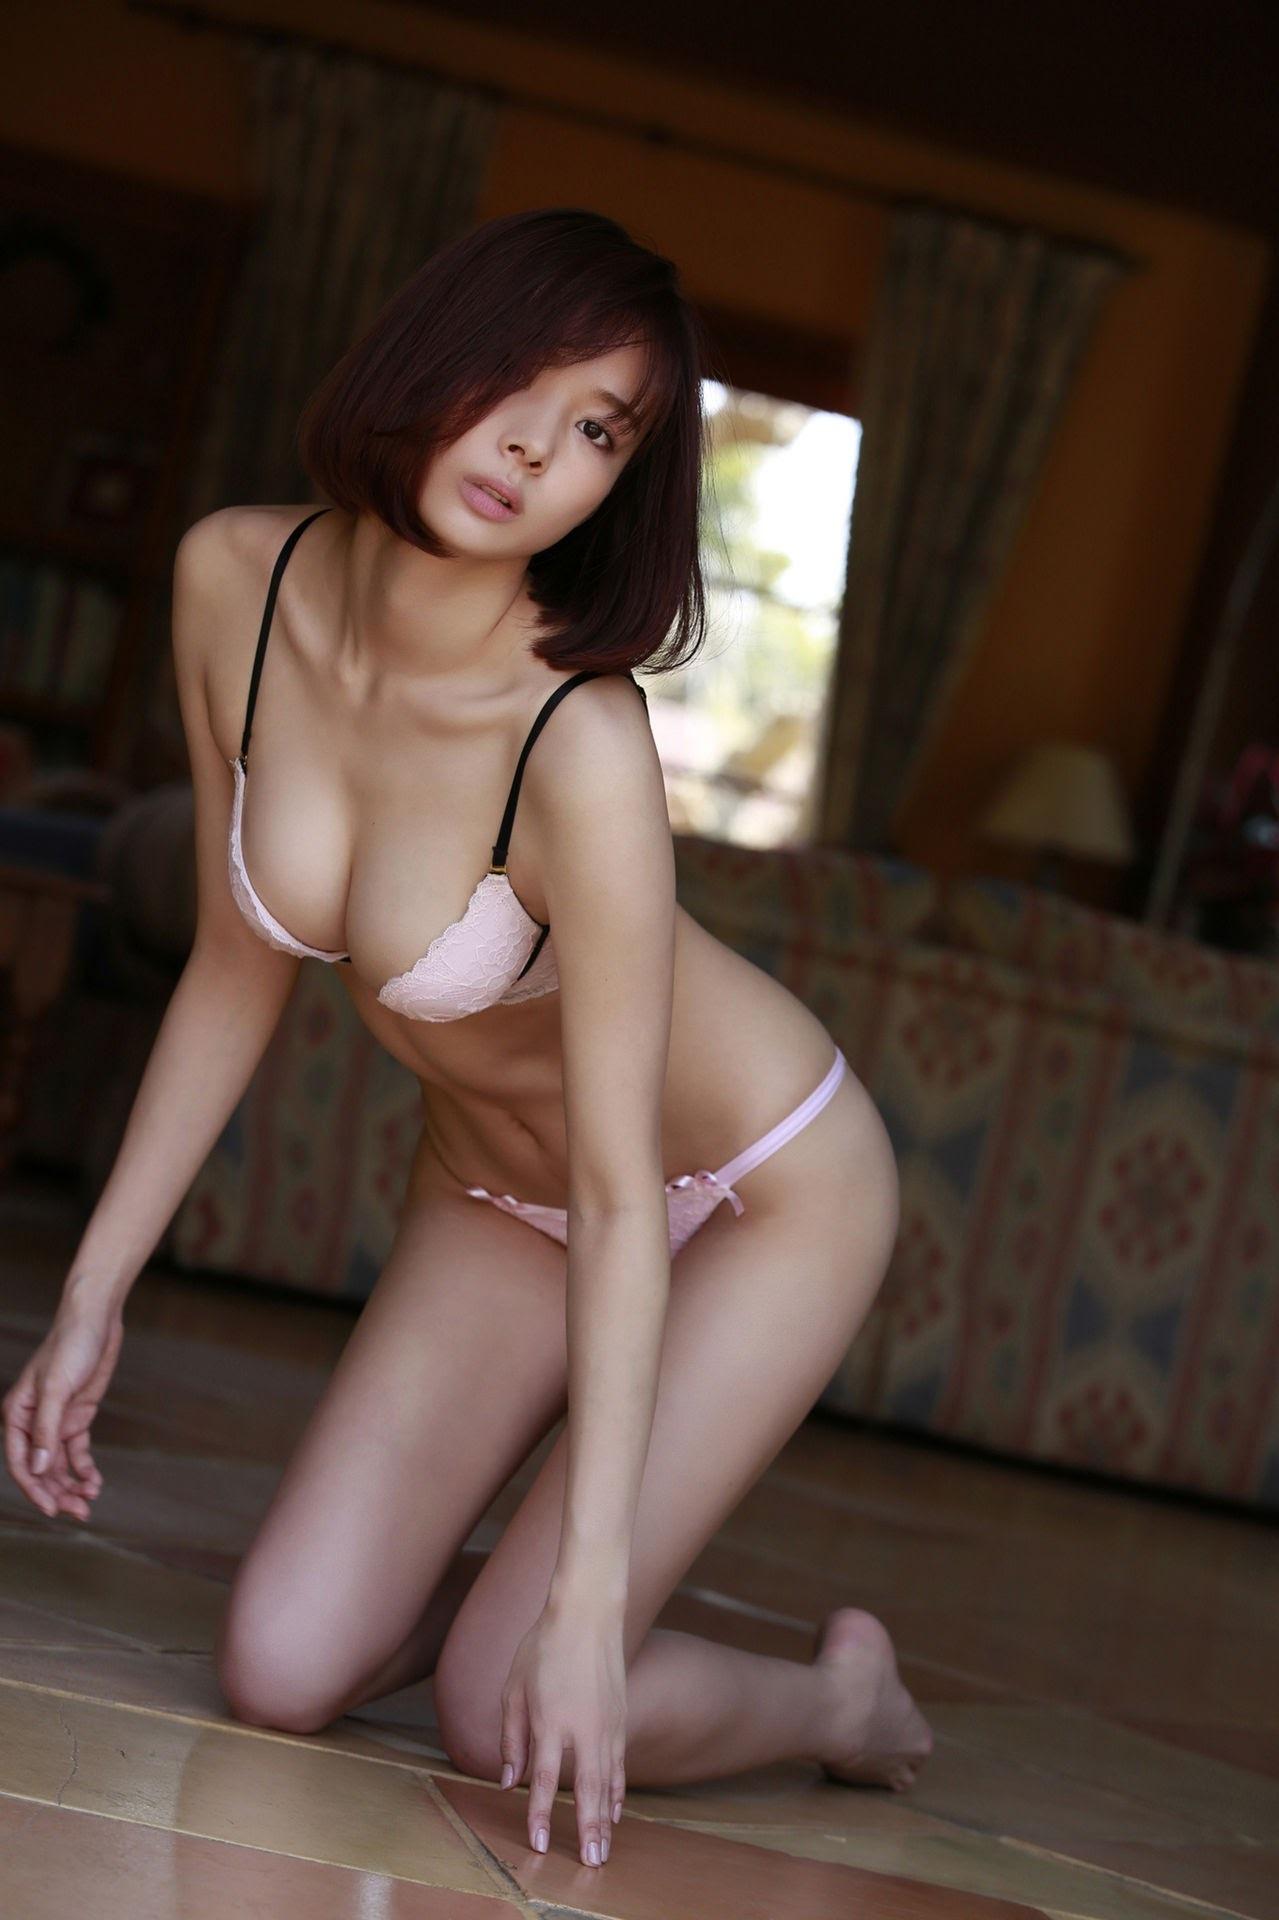 23 years old Shaka Okada, who is also a professional mahjong player033